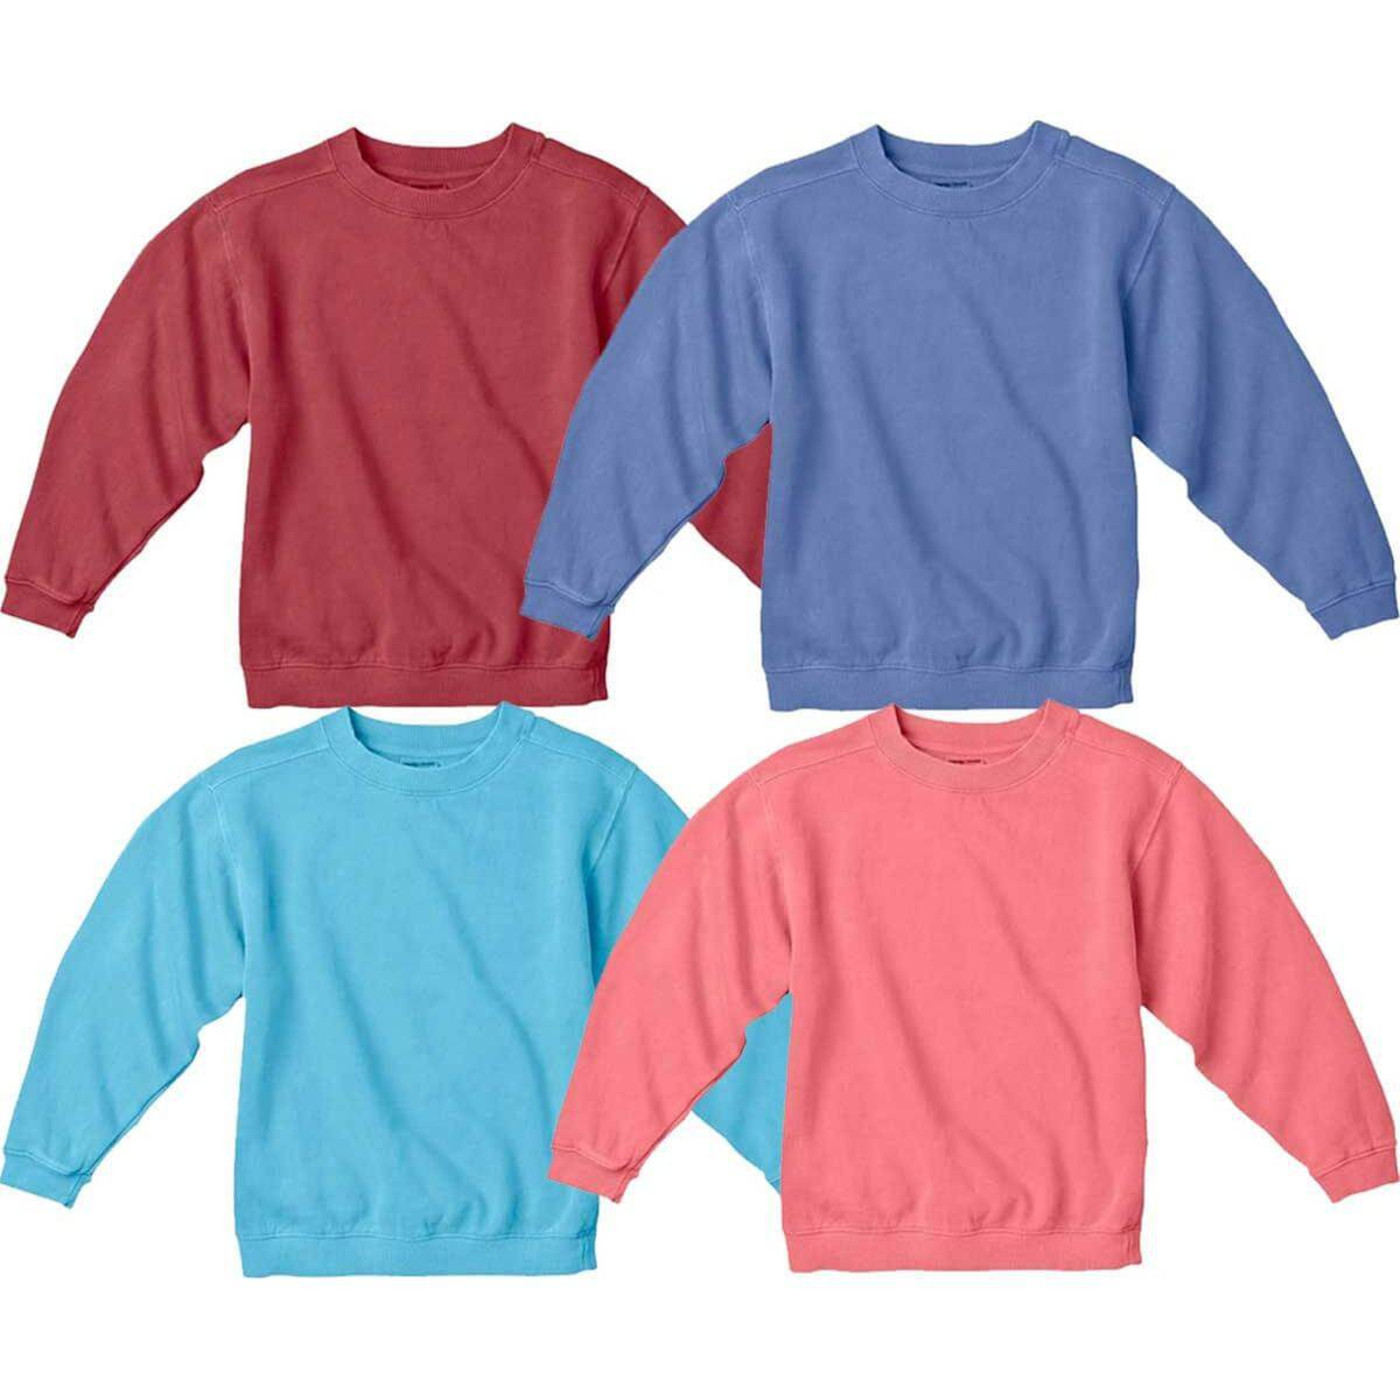 image online catalog custom crewneck products large design sweatshirts customink styles com detail comforter sweatshirt colors comfort at